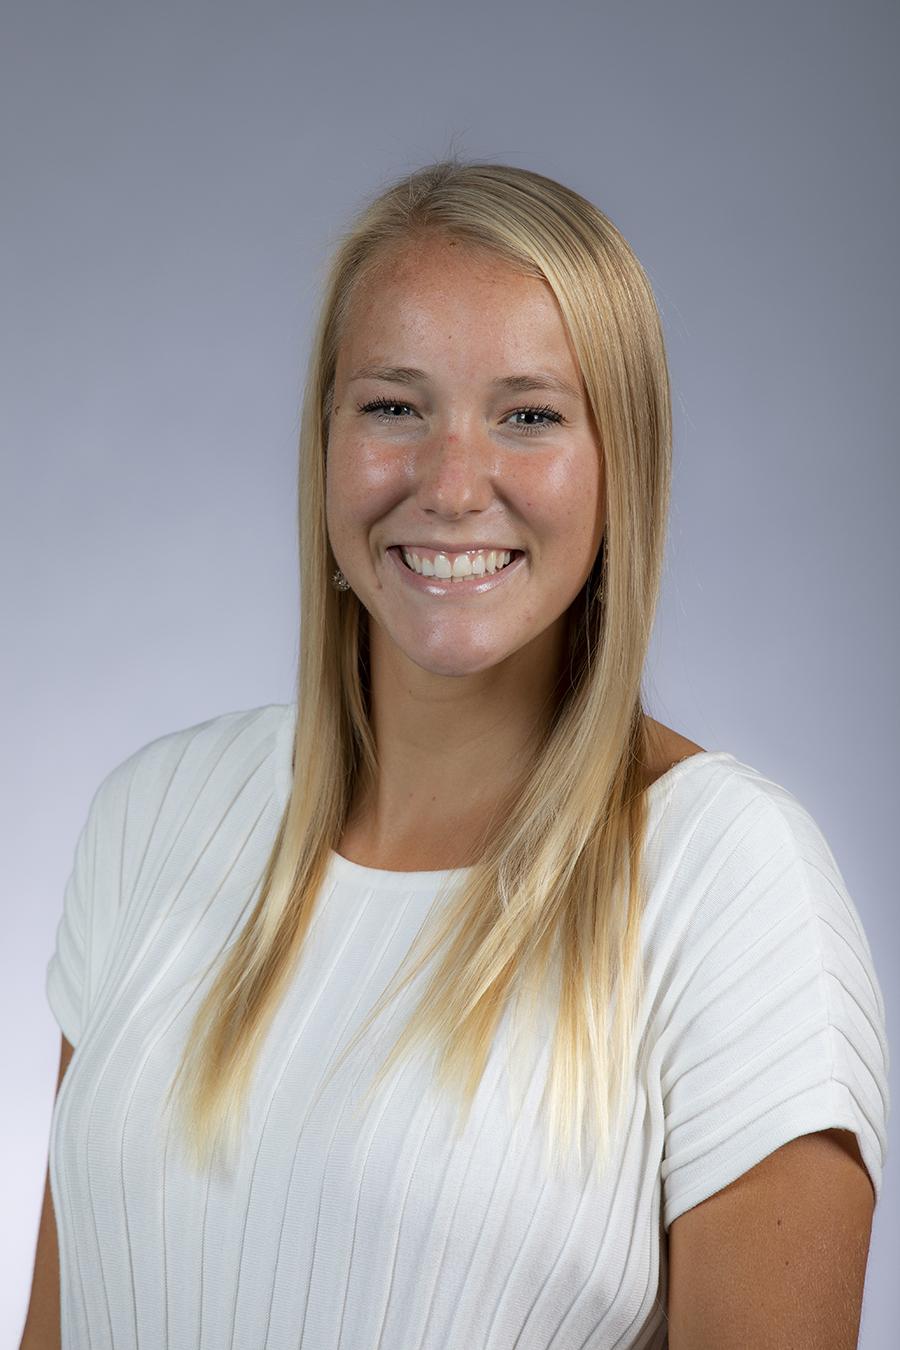 Cassandra Frazier (Christopher Gannon/Iowa State University)